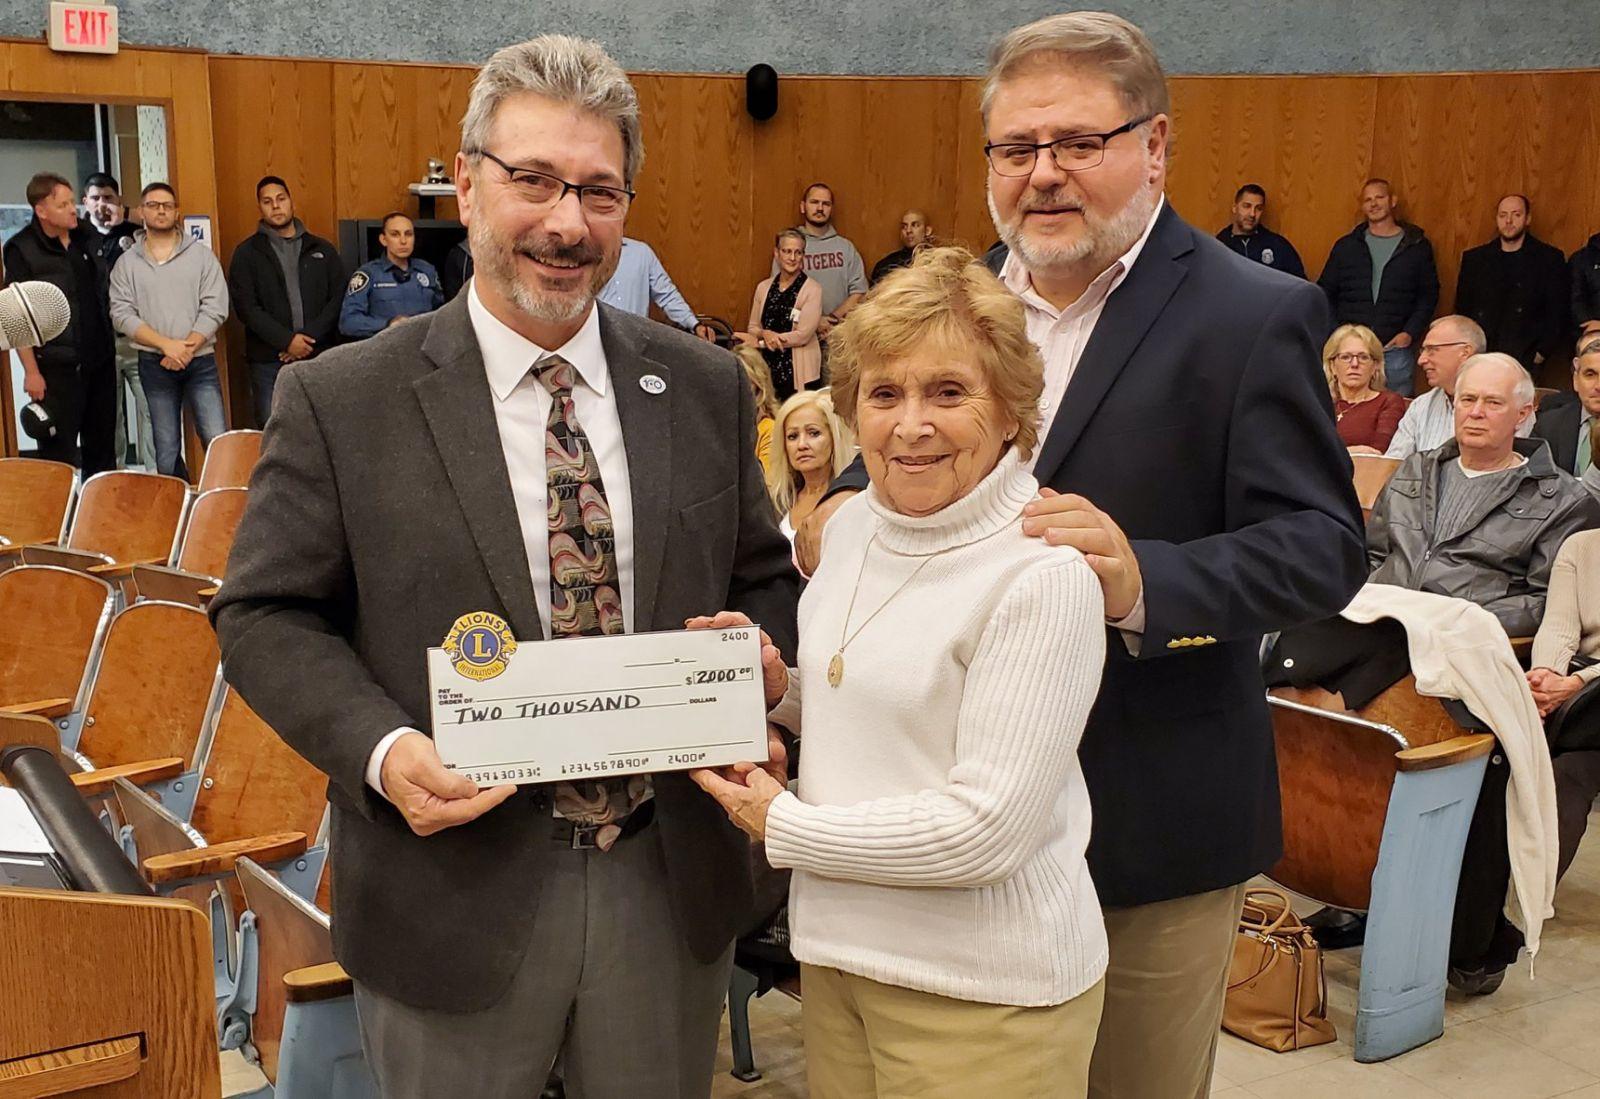 Sandra Pine, Foundation For The Handicapped, Wayne with Mayor Vergano — at Wayne Township NJ.